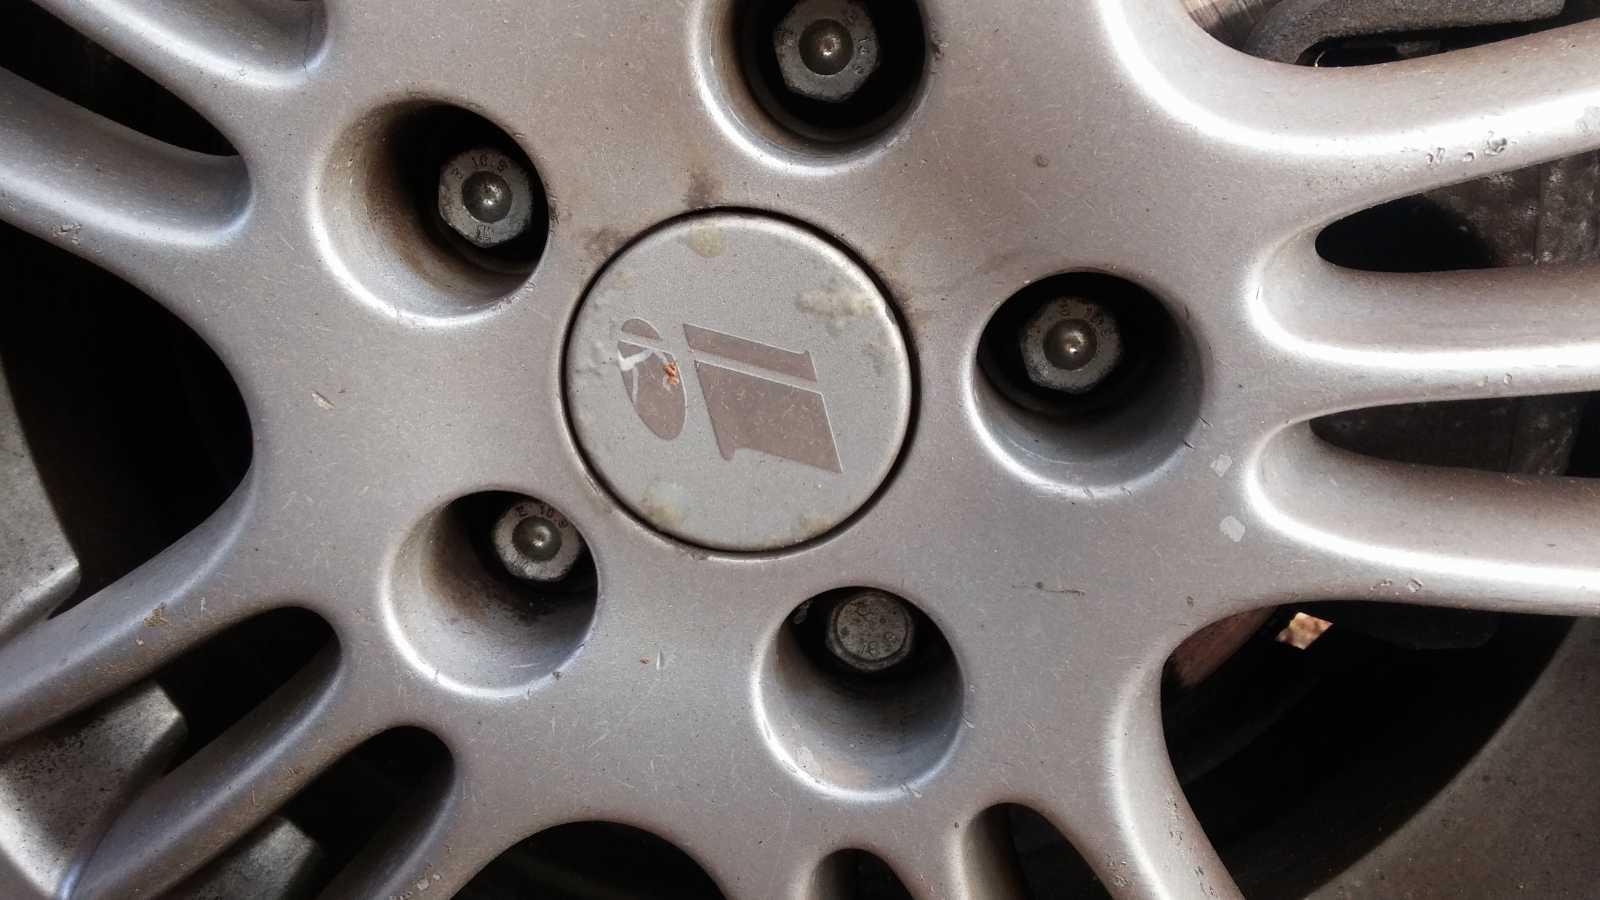 Astra G cabrio 15 inch Irmscher velg a